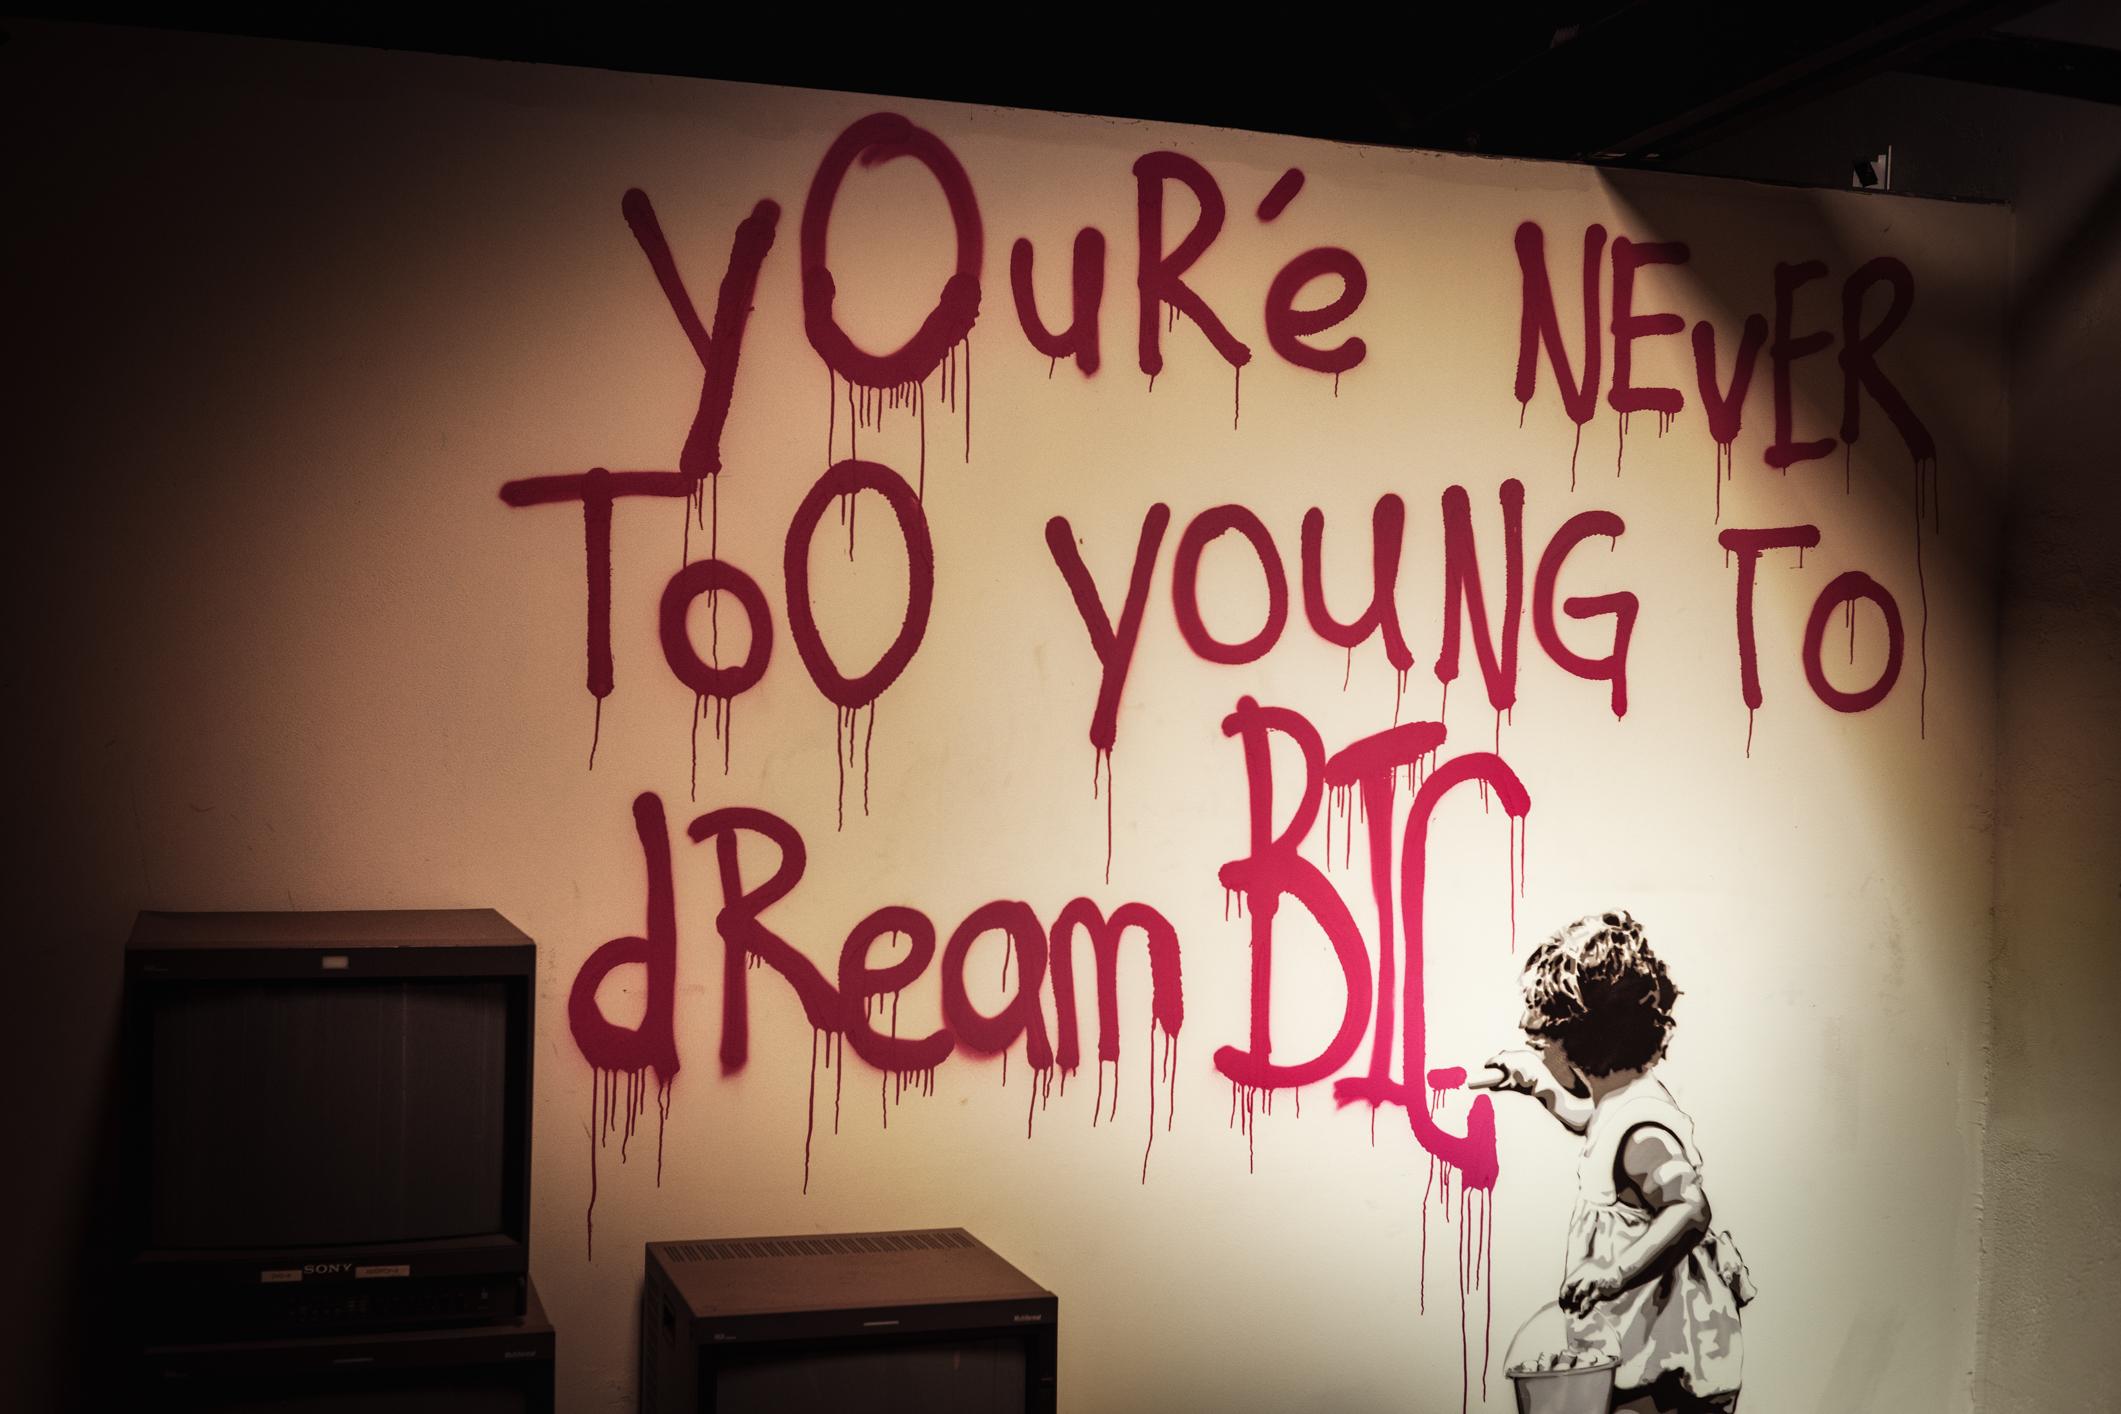 Los-Angeles-dream-big-graffiti.jpg